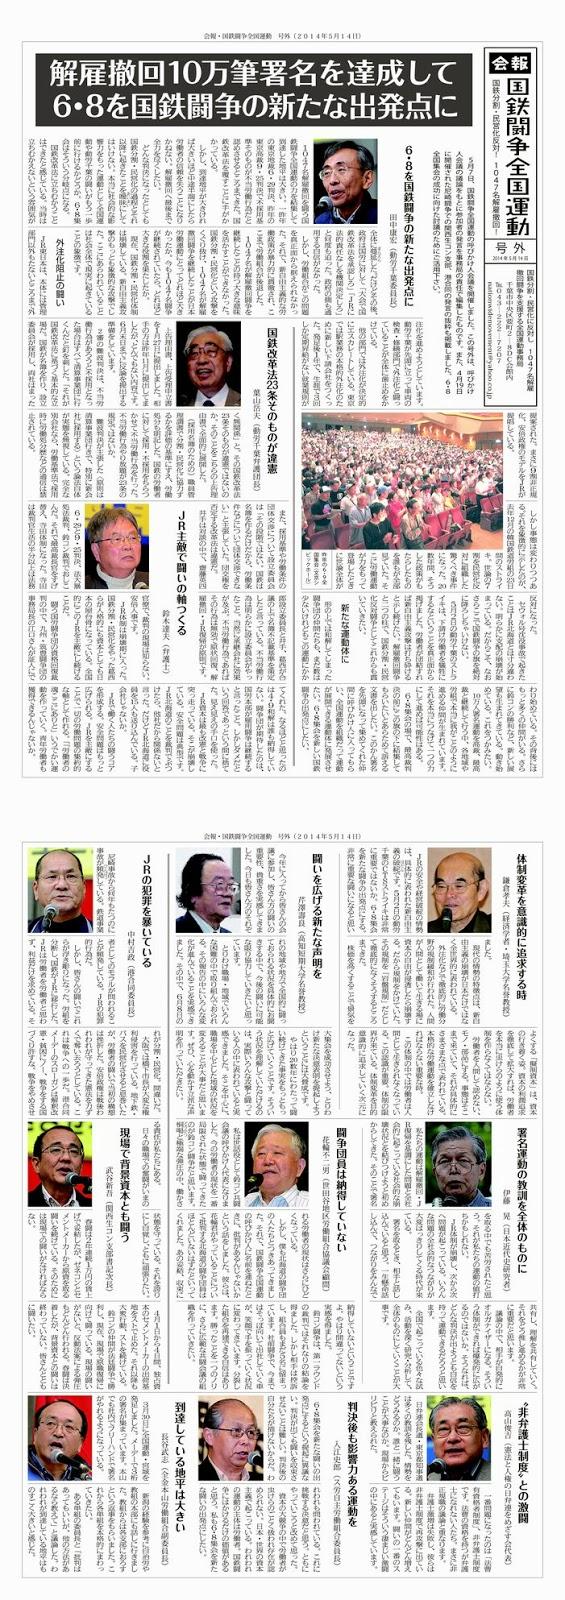 http://www.doro-chiba.org/z-undou/pdf/news_gougai.pdf